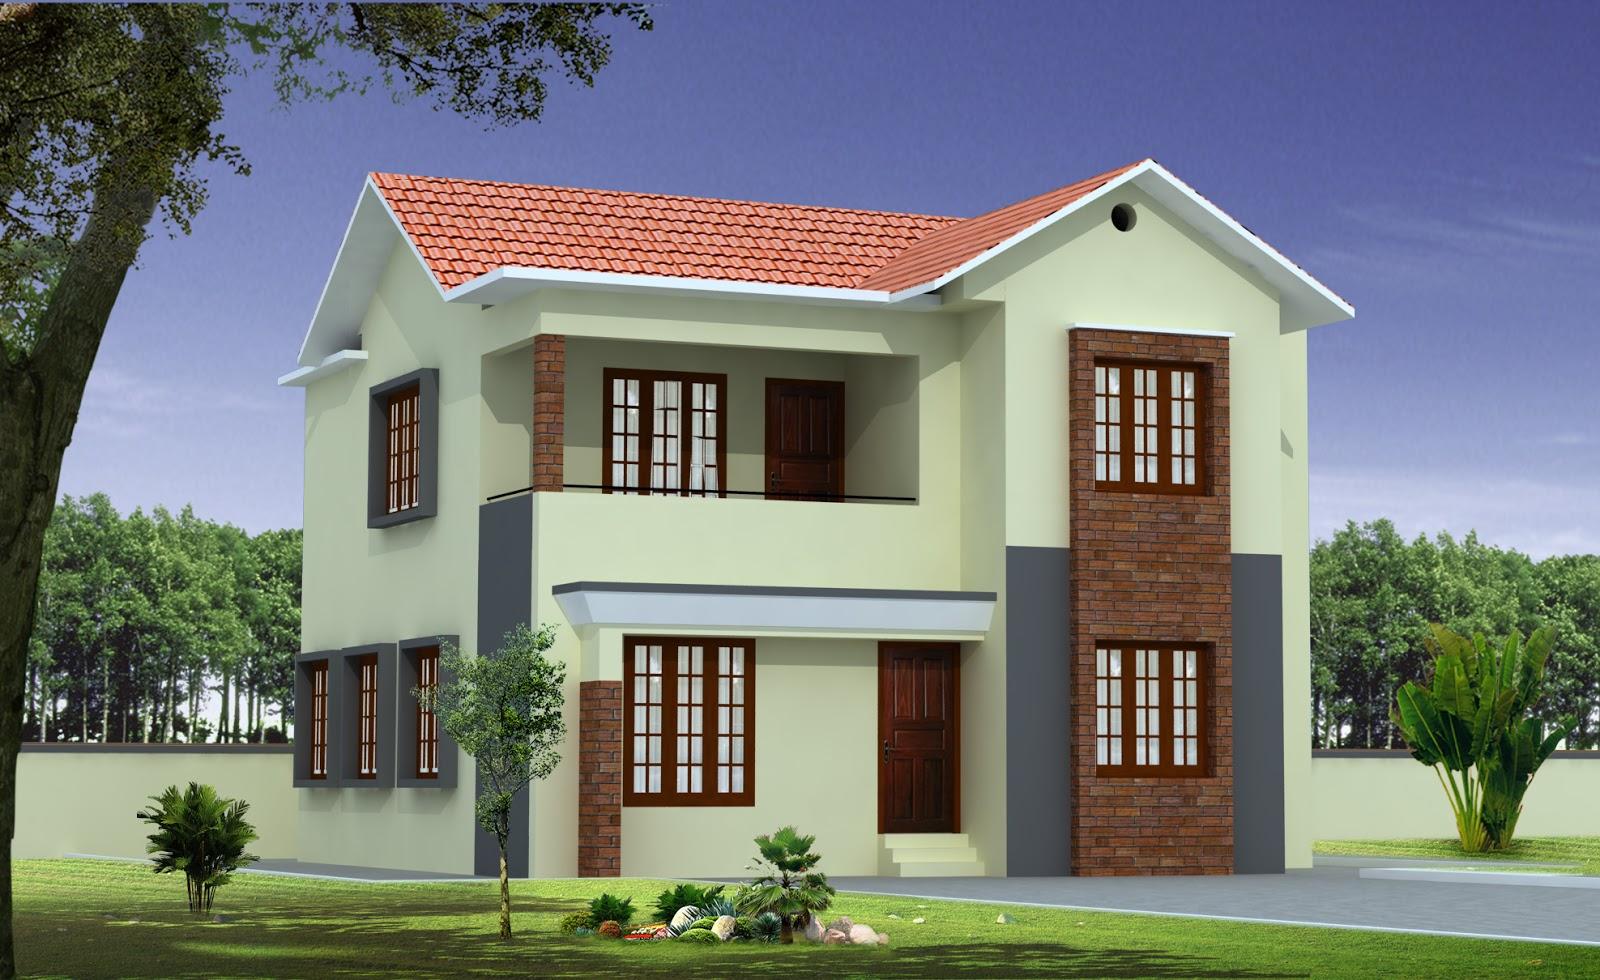 brilliant modern house building plans. Building a home designs  Home design and style Best A House Design Ideas Photos Liltigertoo com